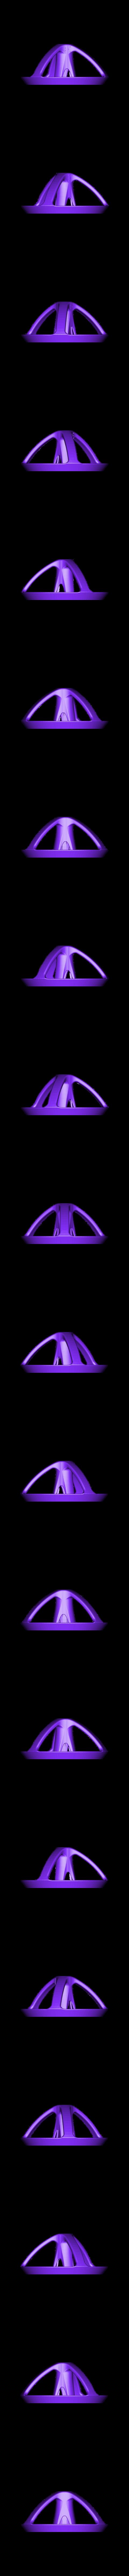 QX7_Gimble_Protector_V4_8.2mm.stl Download free STL file QX7 Gimbal Protector V4 • 3D printable design, Elliott